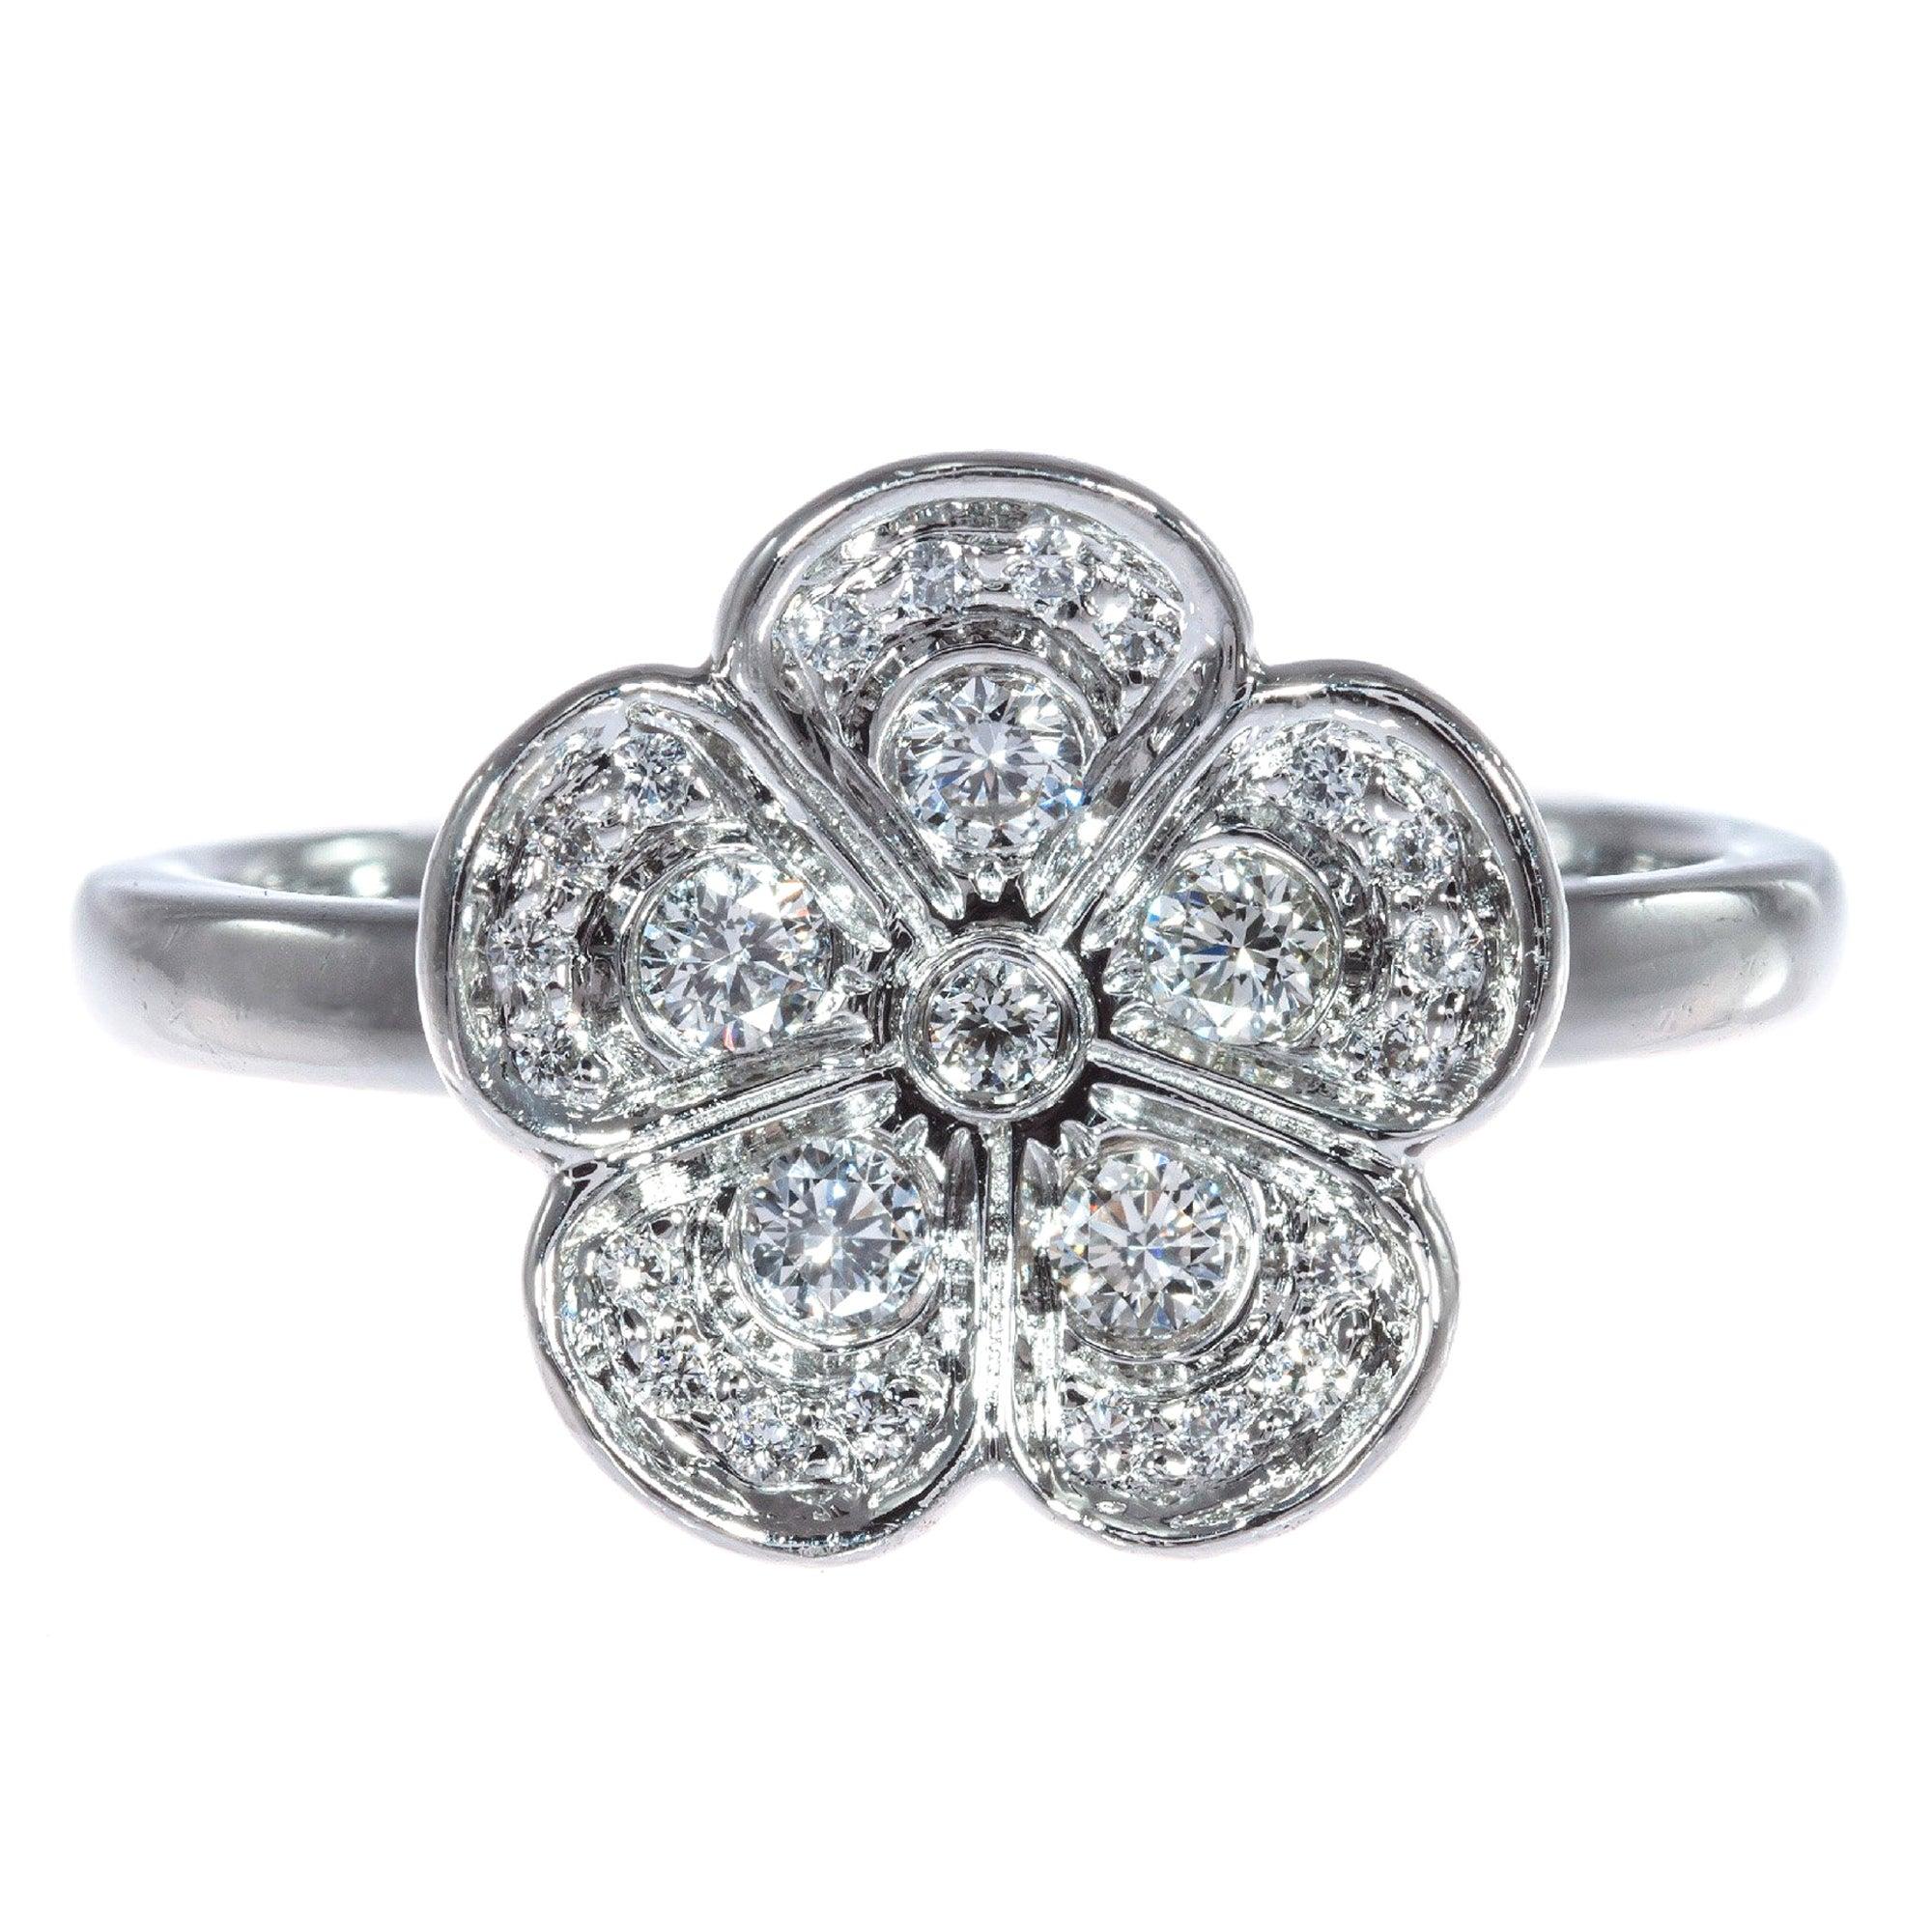 Tiffany & Co .30 Carat Diamond Platinum Flow Cocktail Ring